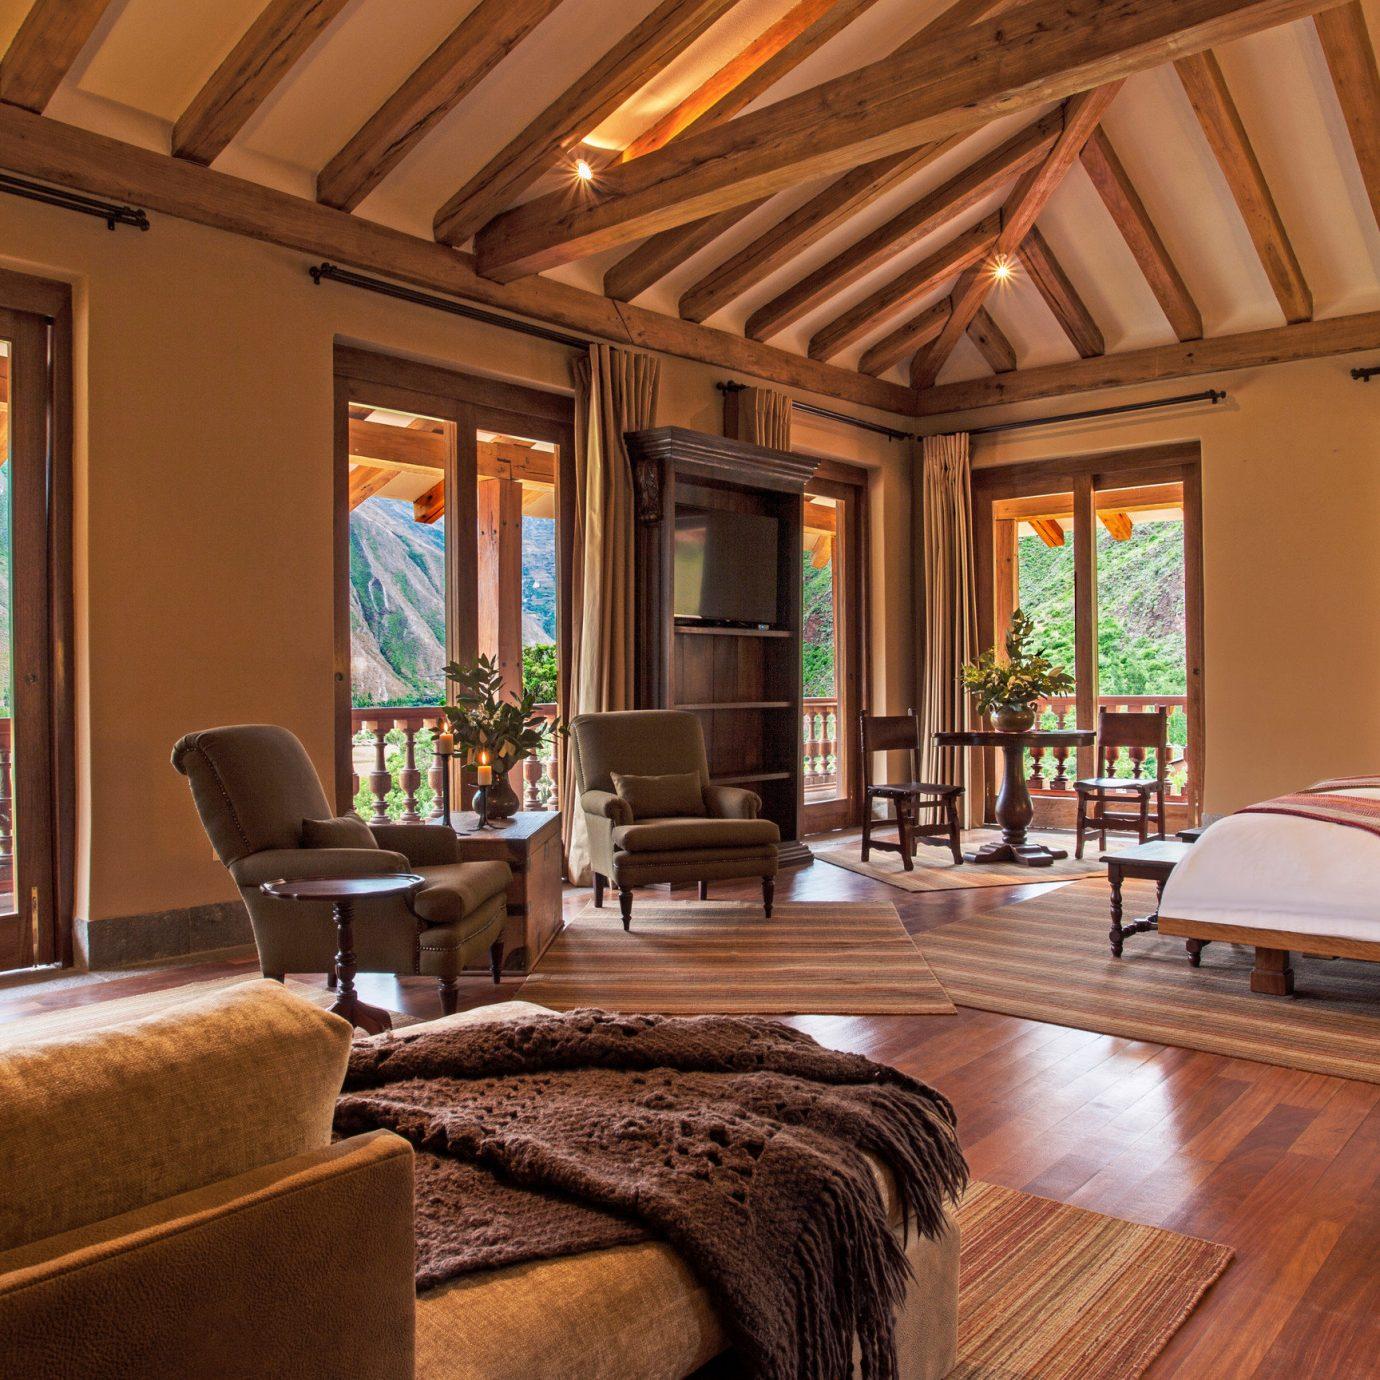 sofa property living room home Resort hardwood mansion Villa Suite wood flooring farmhouse cottage recreation room condominium